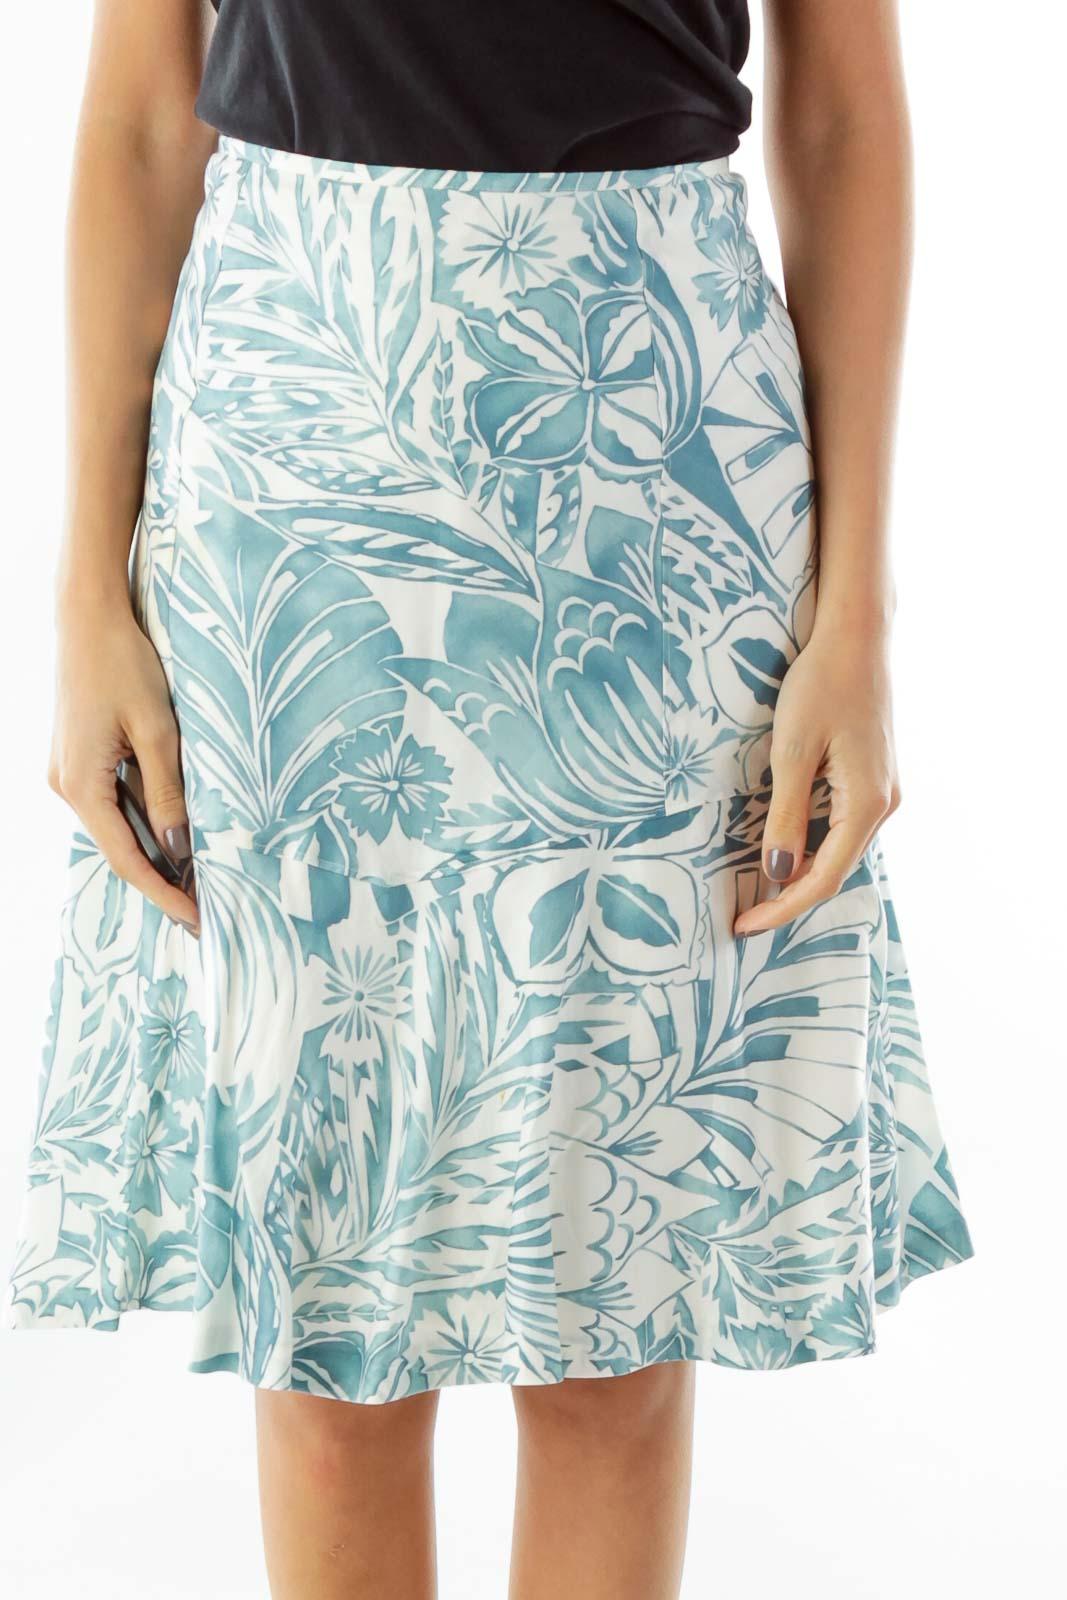 Blue White Print A-Line Skirt